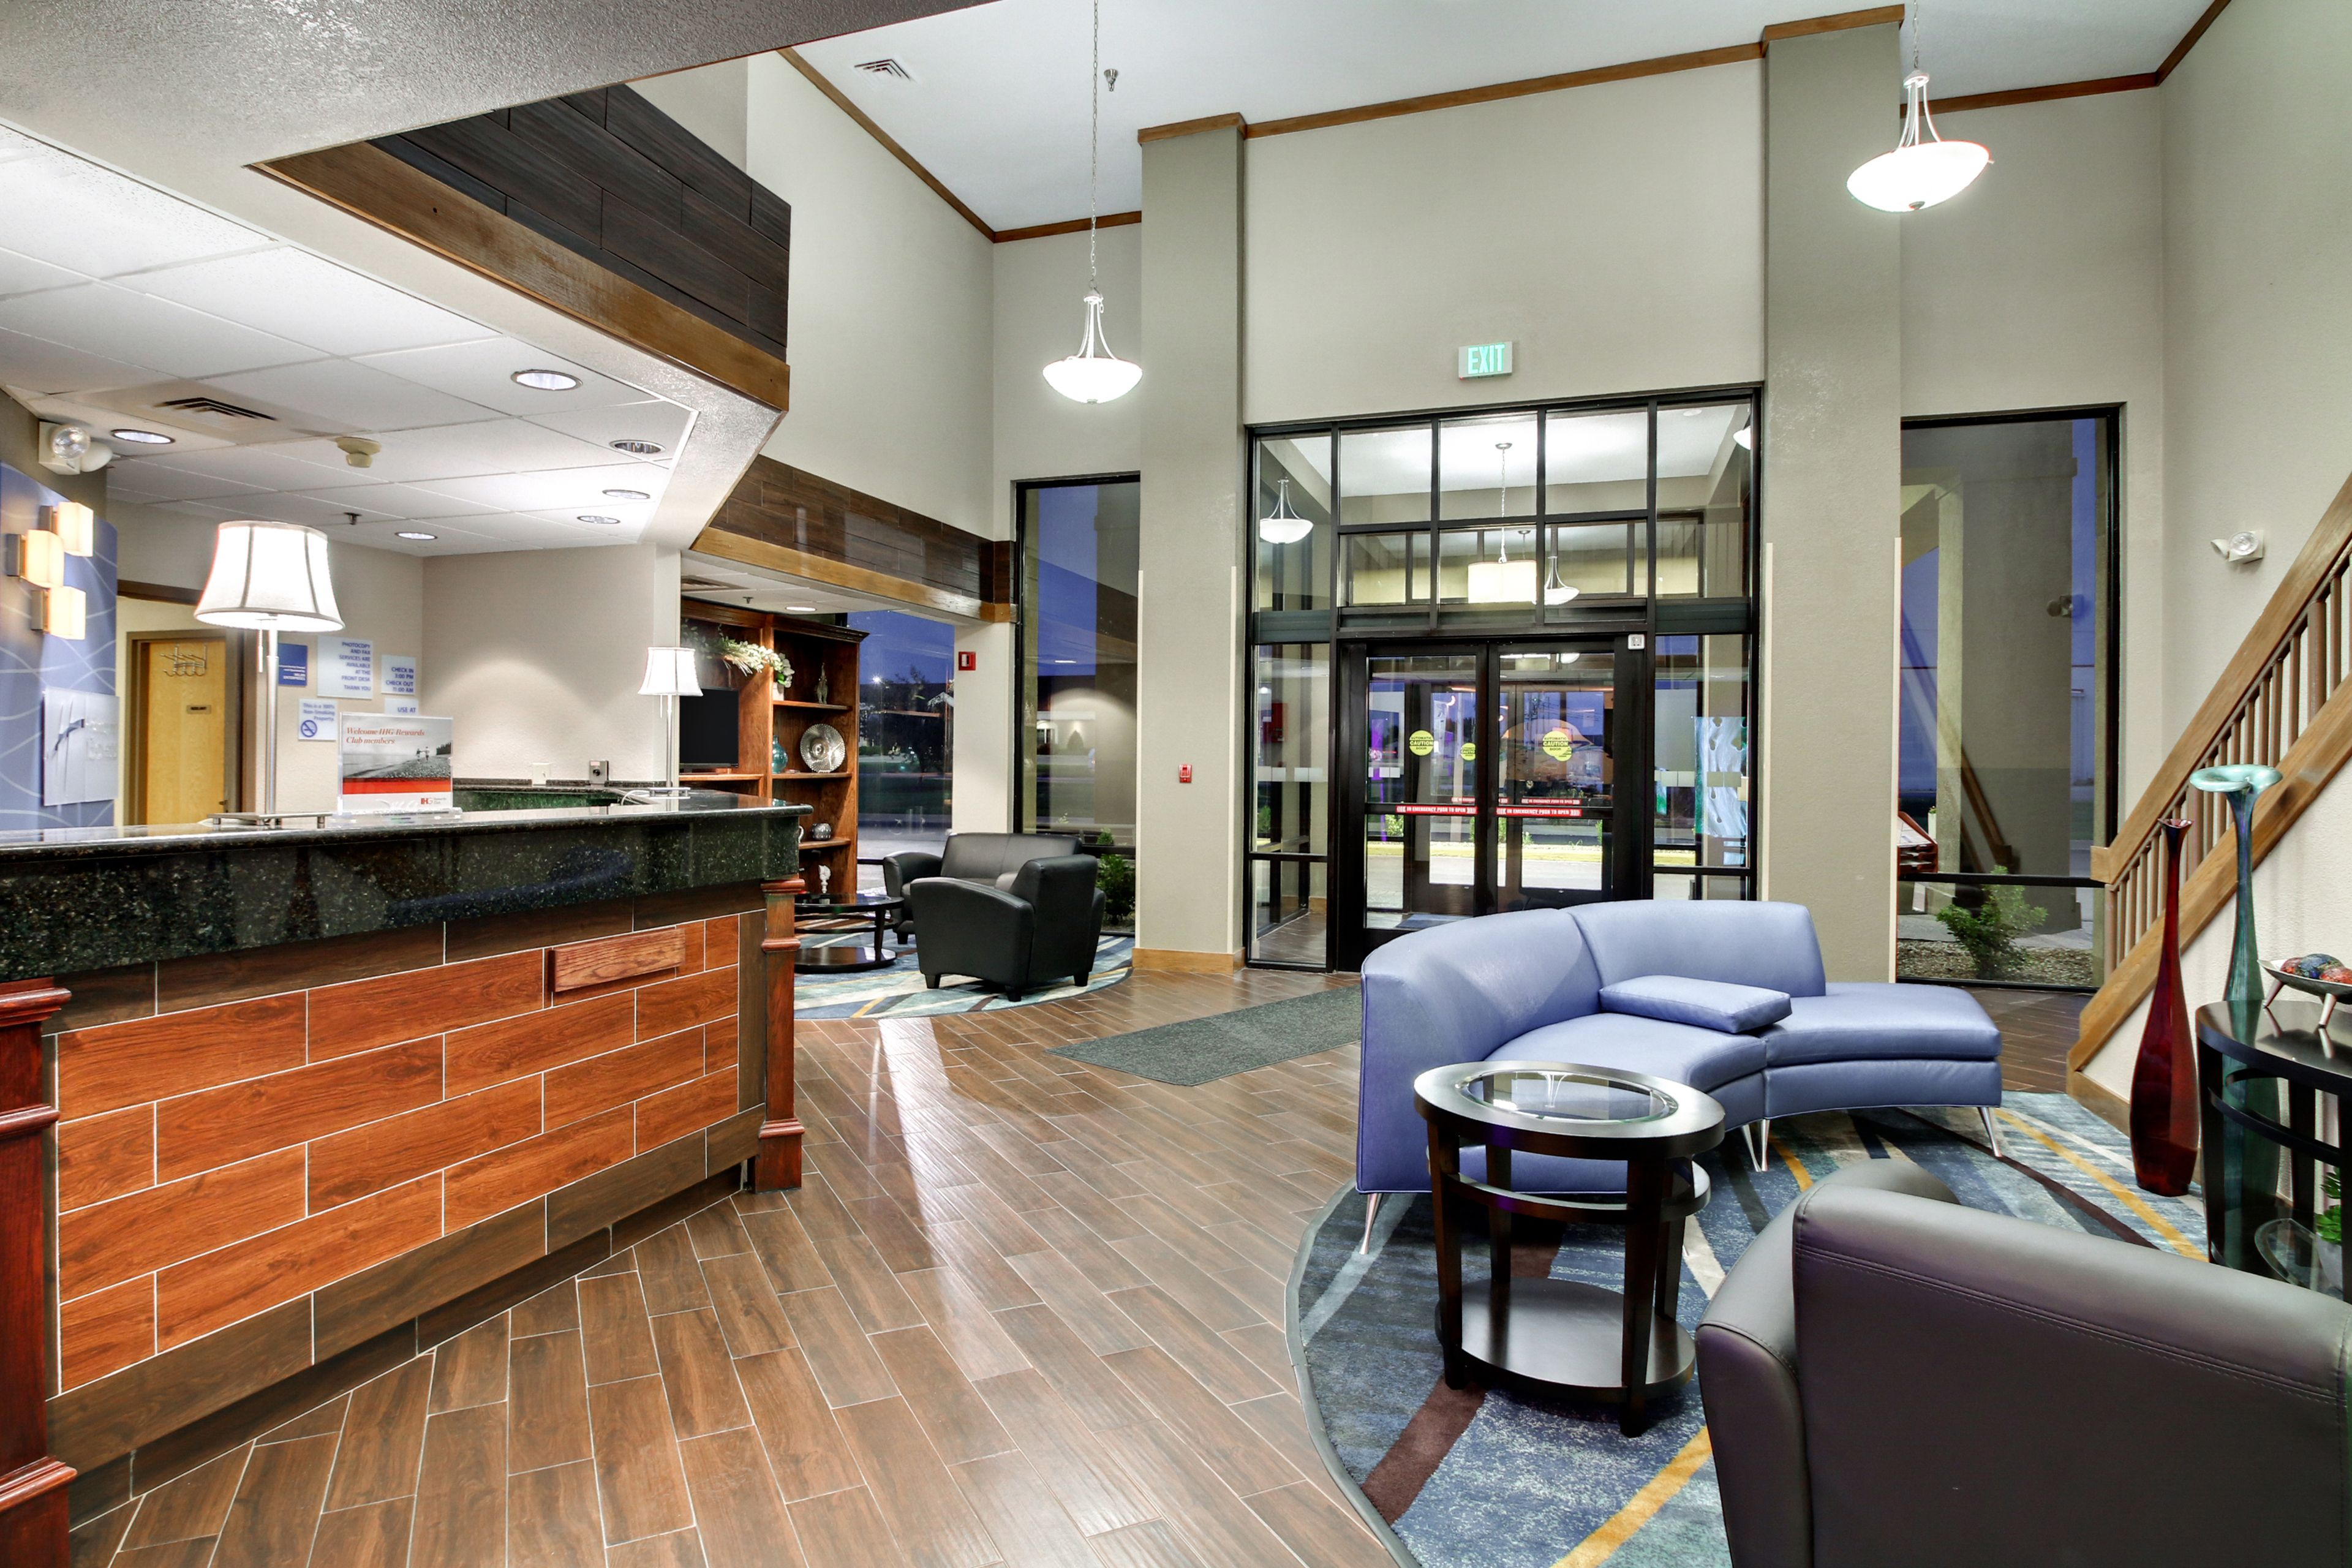 Holiday Inn Express Marshfield (Springfield Area) image 3